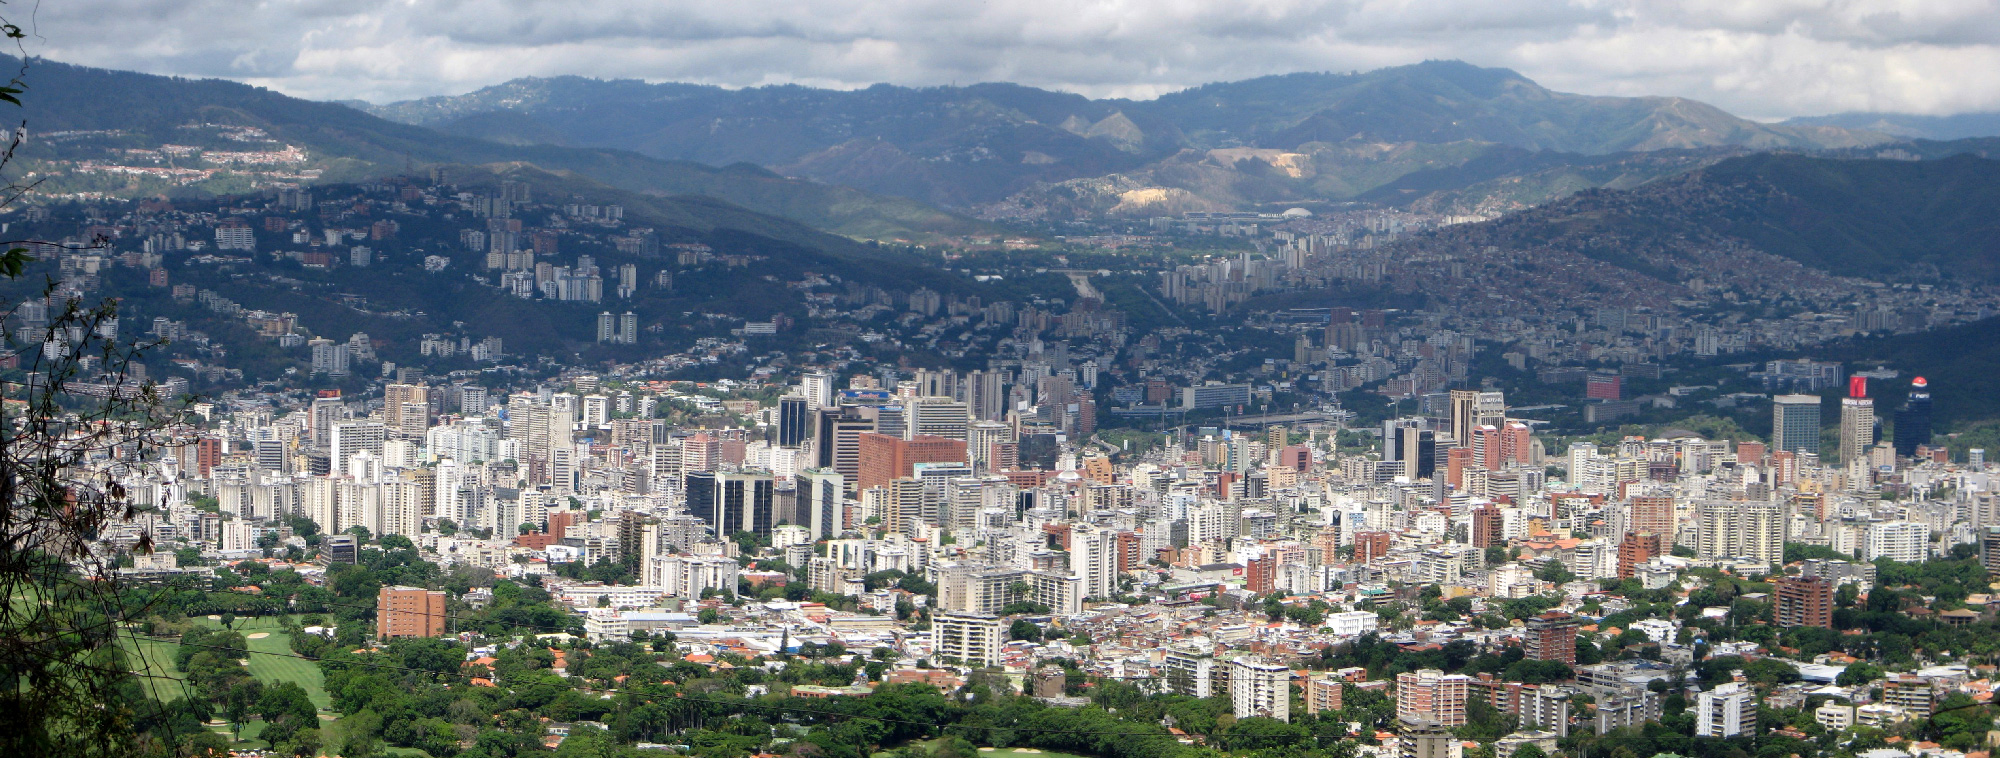 Caracas Skyline, caracas venezuela, caracas, caracas altamira, pictures of caracas, pictures venezuela